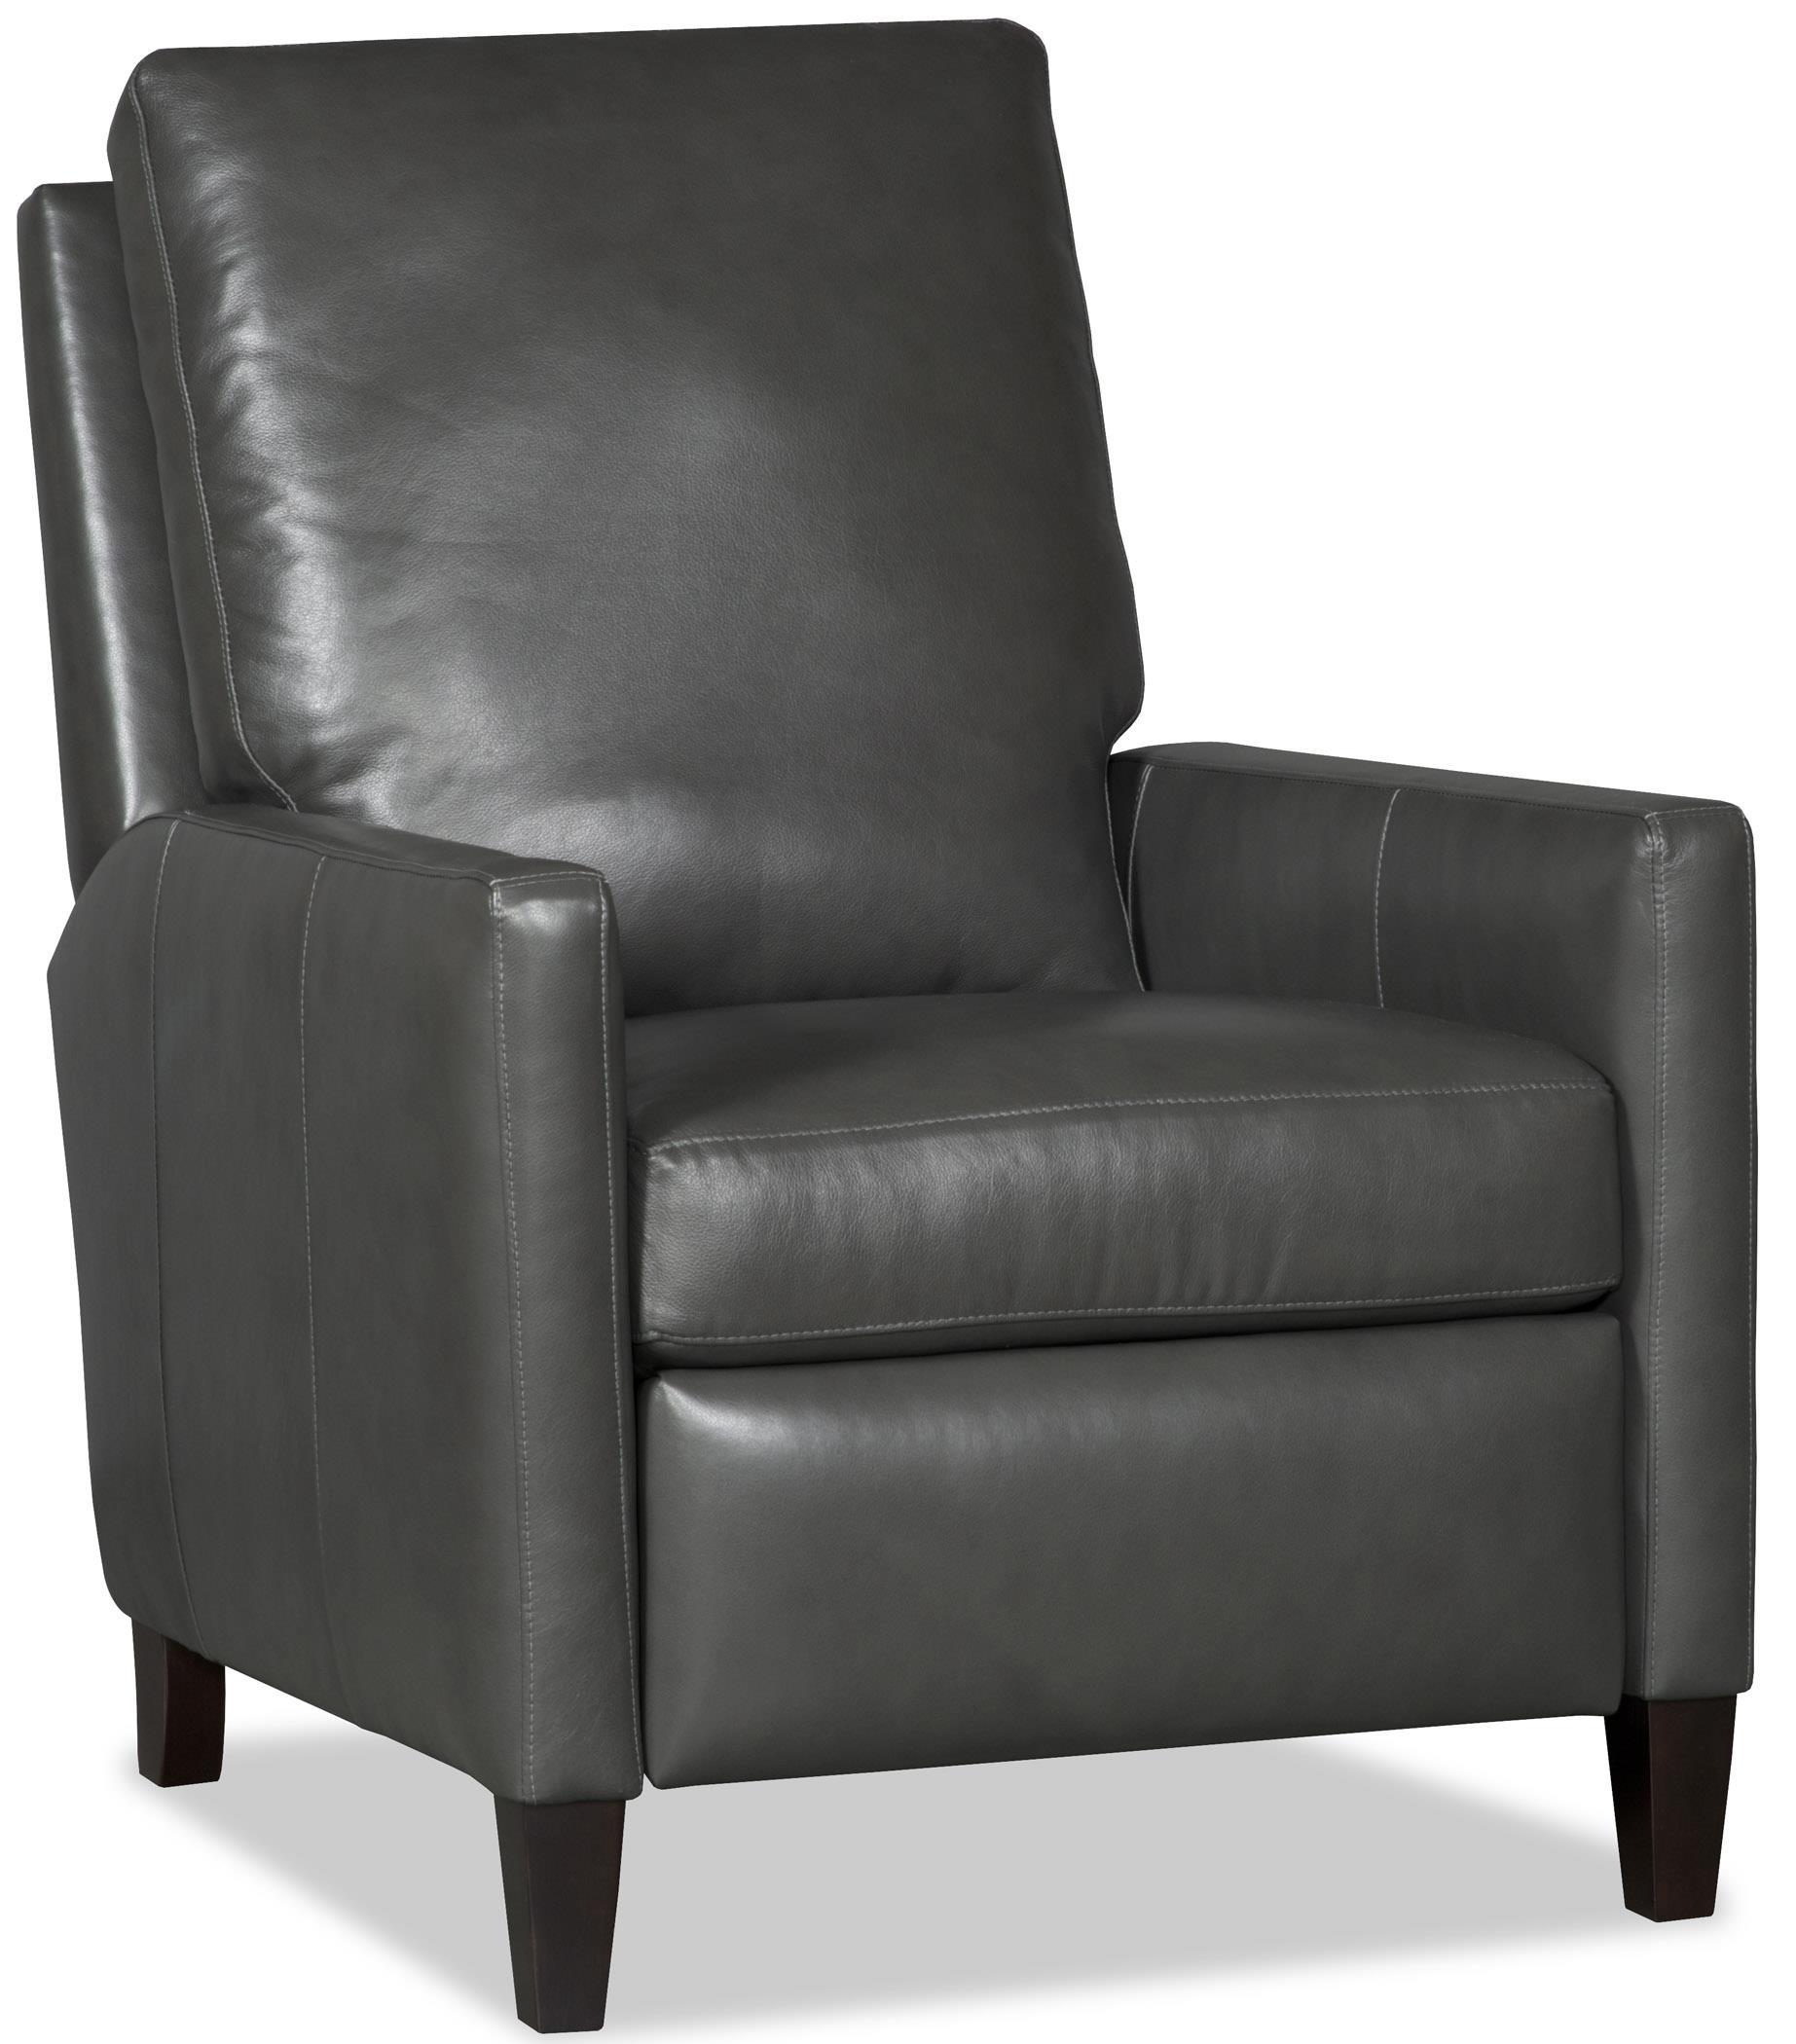 Bradington Young Chairs That Recline Castiel Power Motion ...